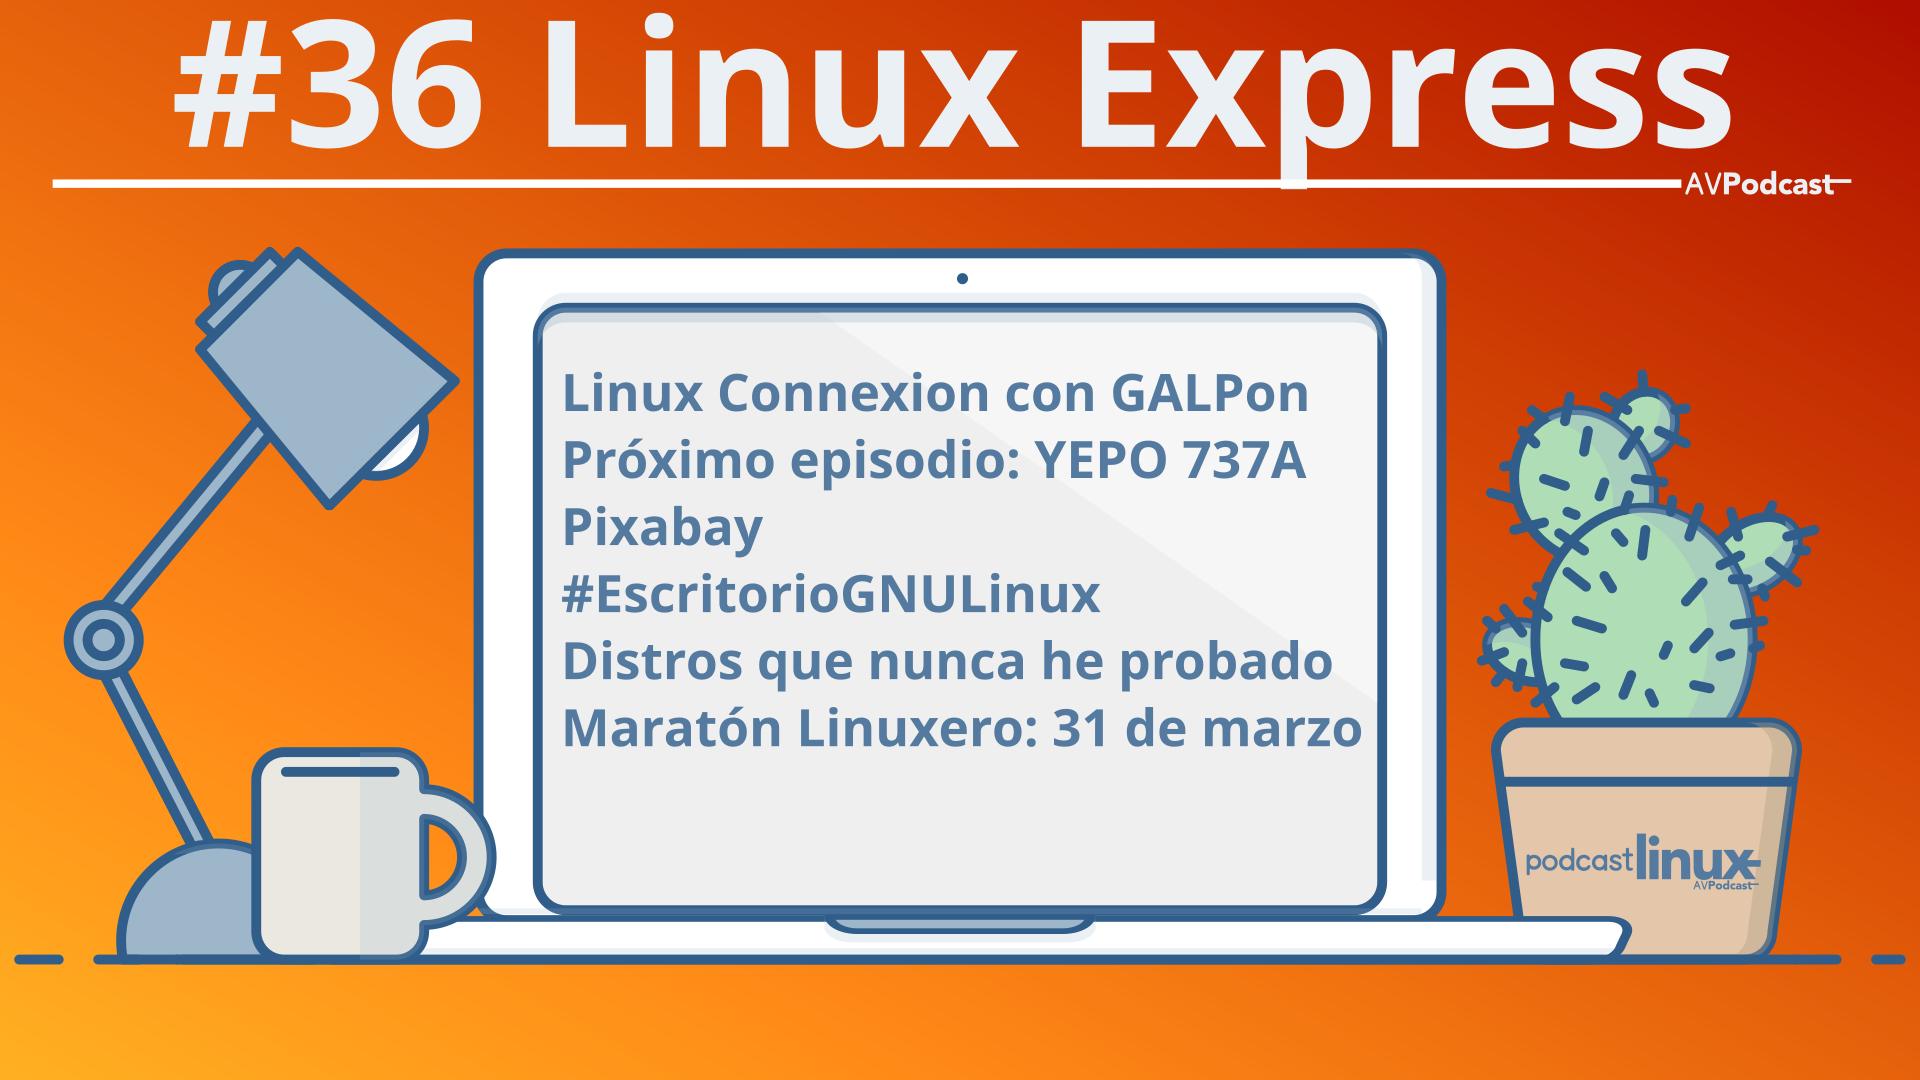 #36 Linux Express